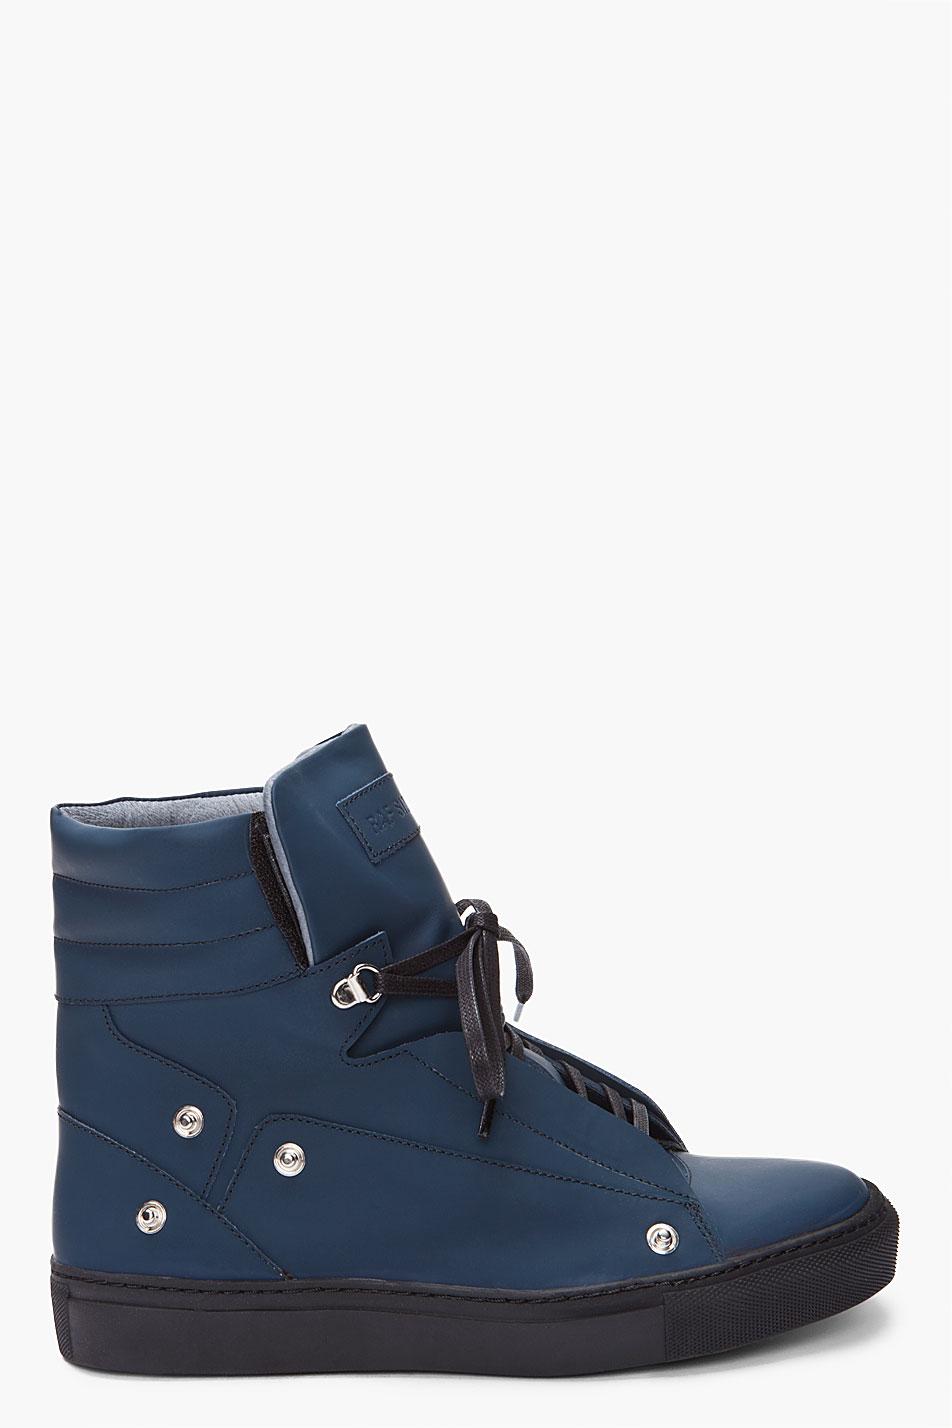 raf simons high top sneaker in blue for men lyst. Black Bedroom Furniture Sets. Home Design Ideas